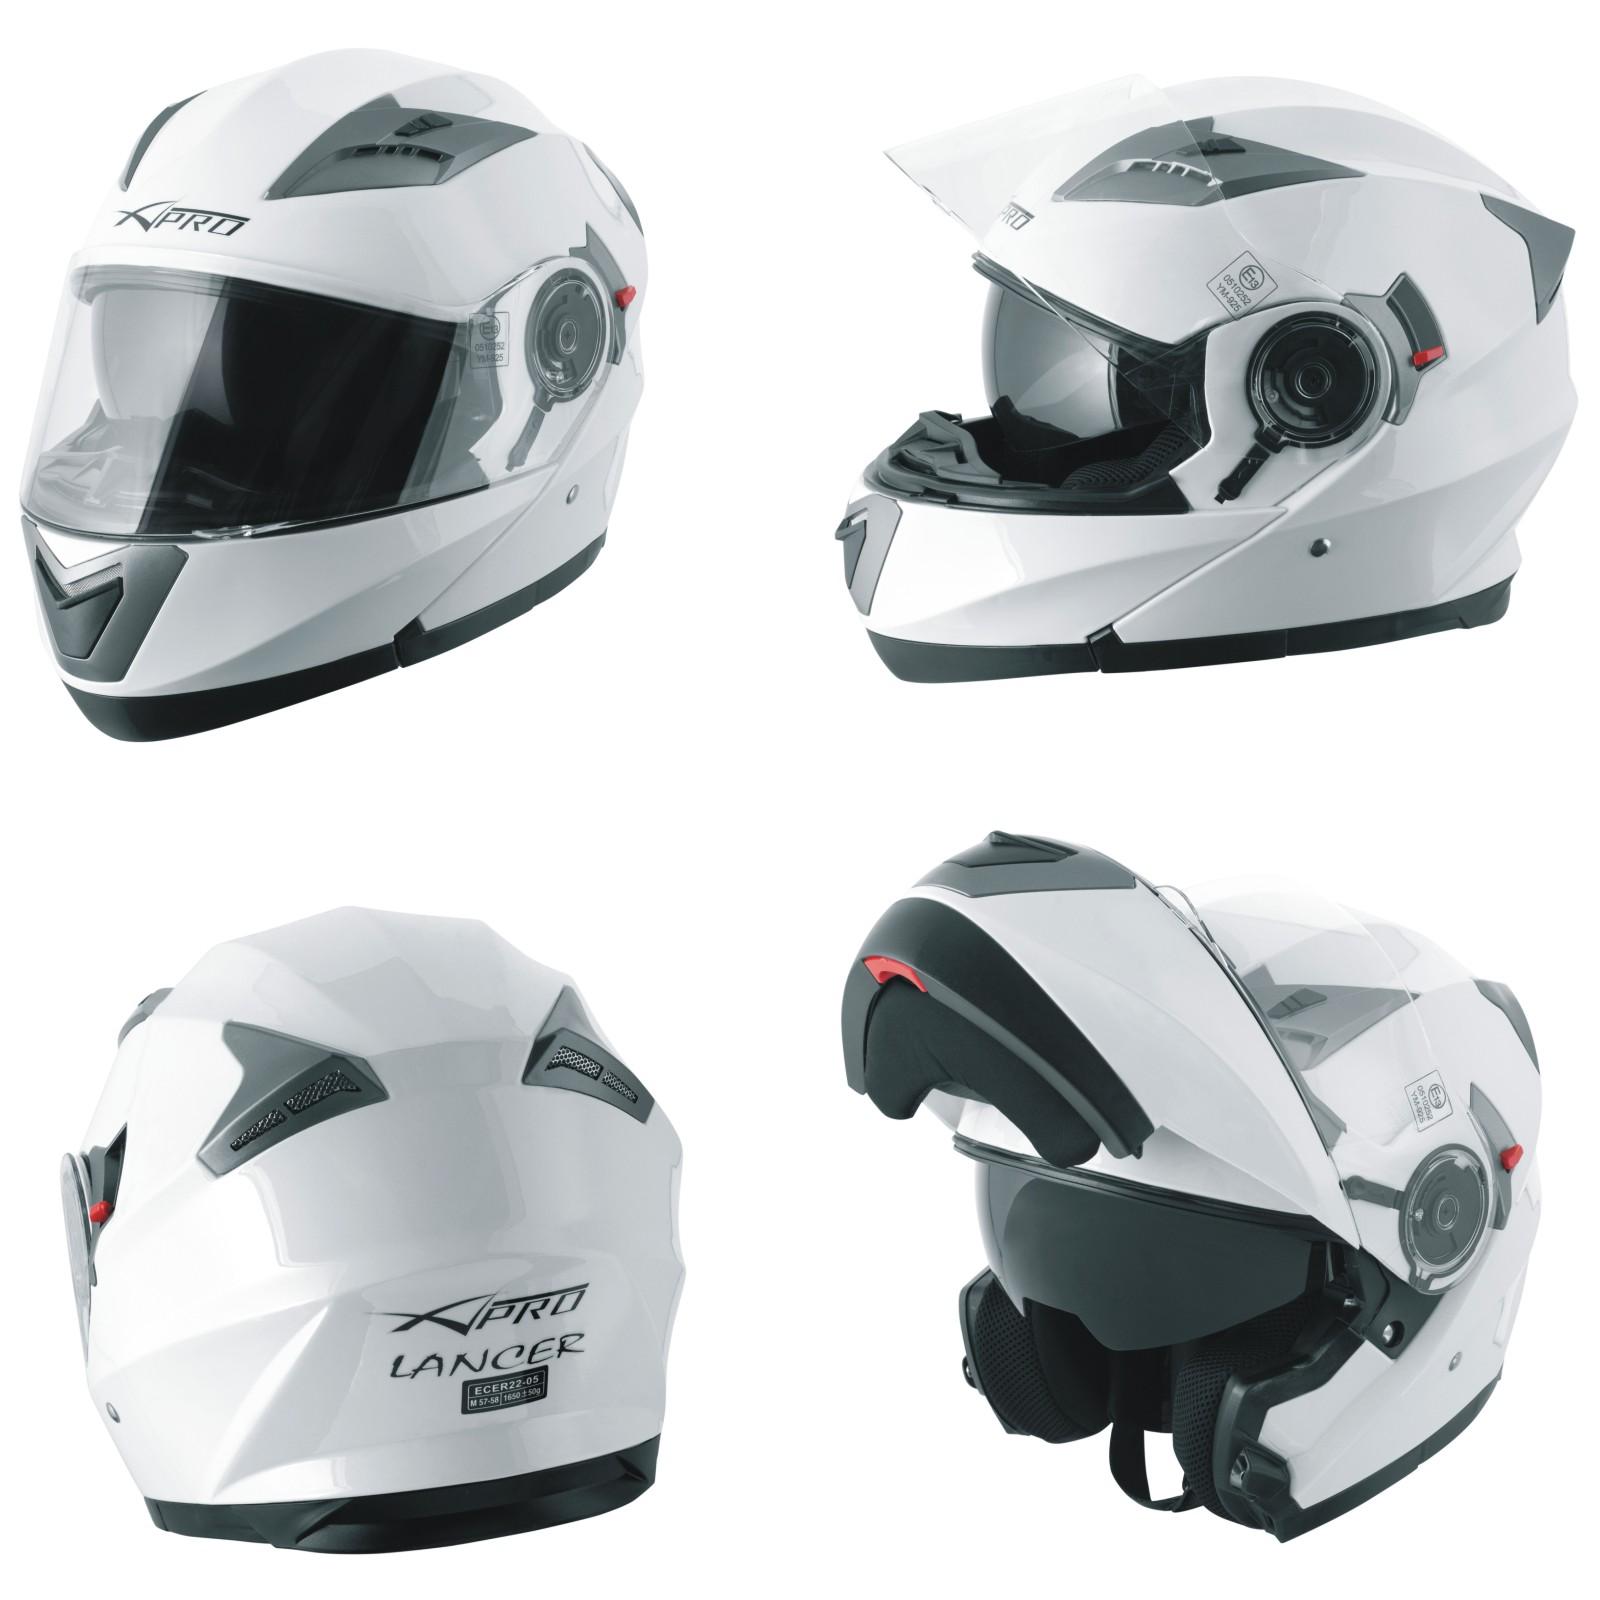 Casco-Modulare-Apribile-Moto-Touring-Sport-Visiera-Parasole-Bianco